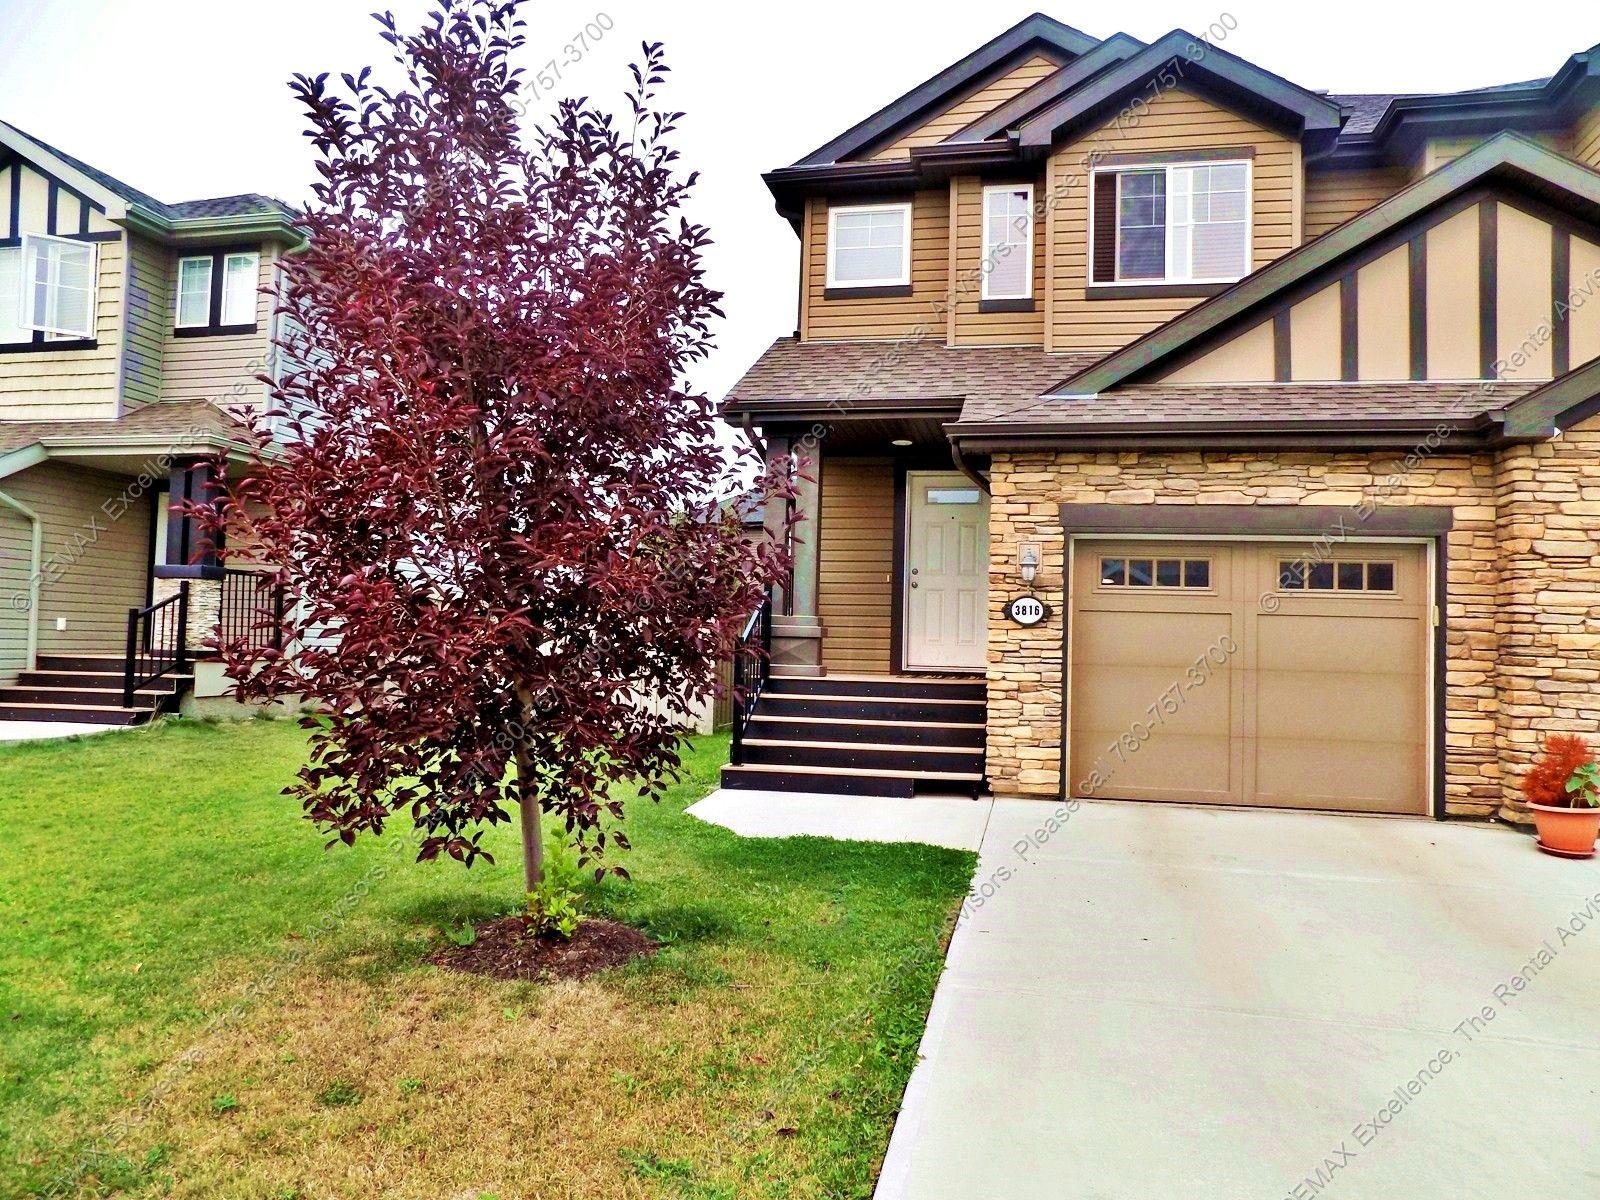 Calgary Edmonton Residential Property Management For Rent Property House Property Property Management